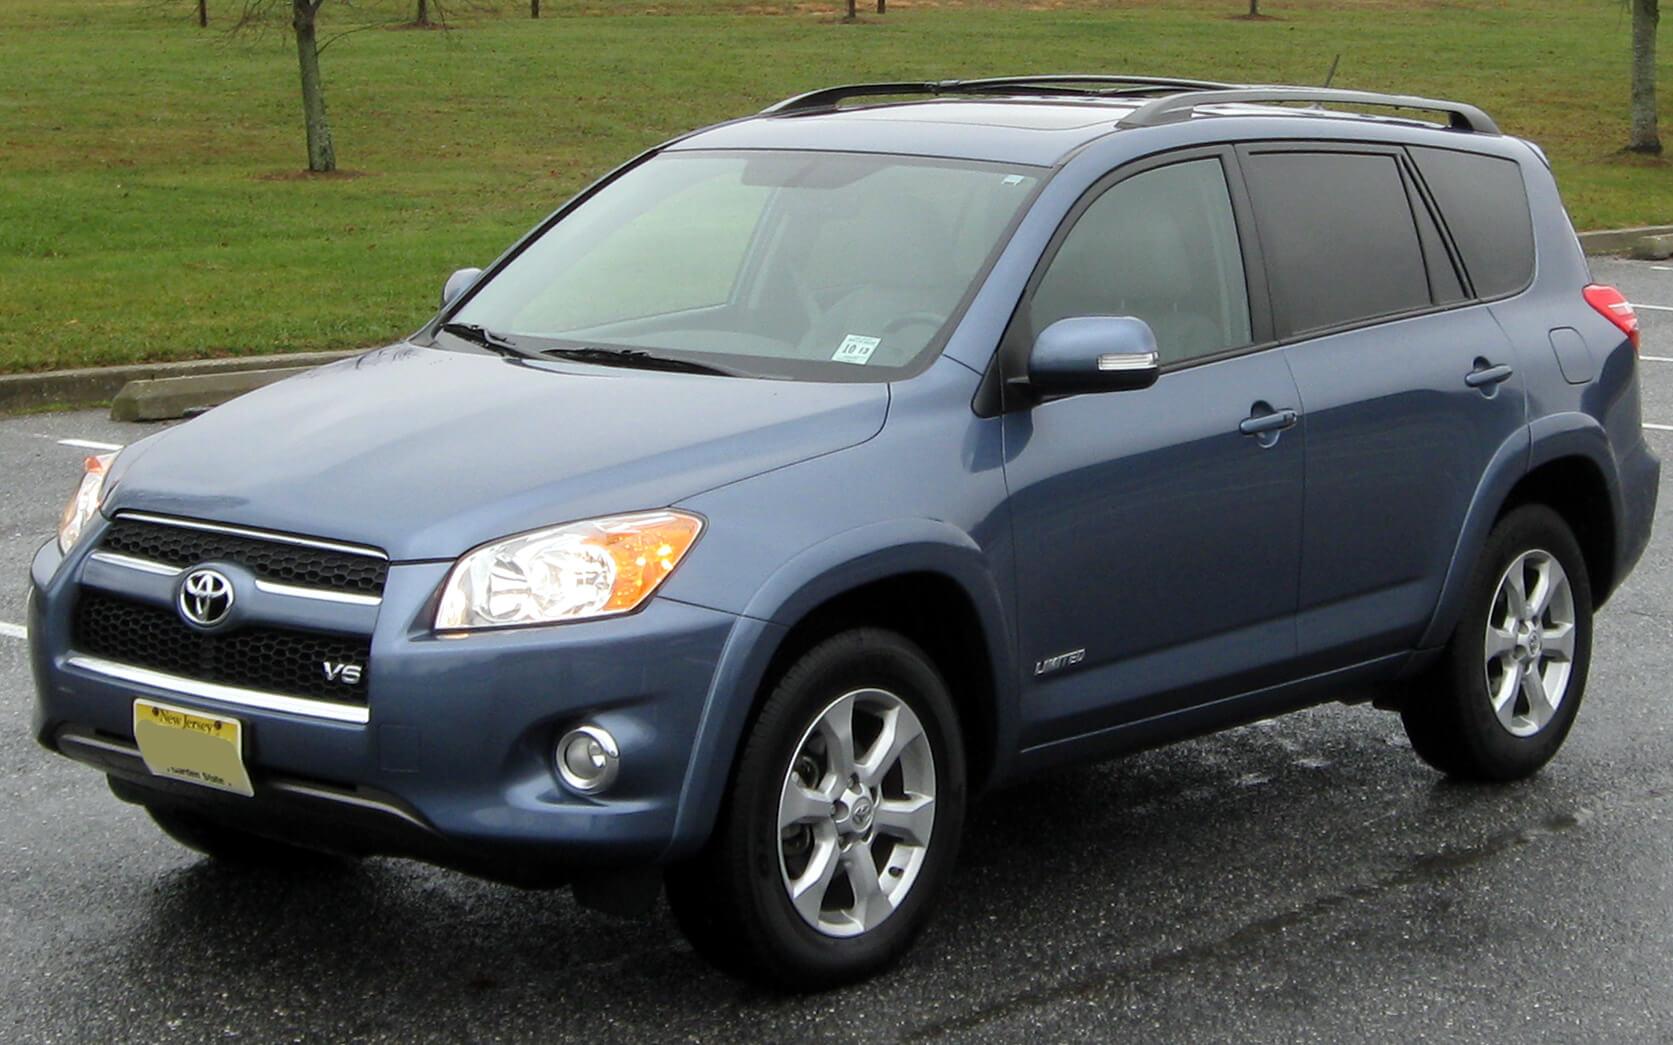 Toyota RAV4 2010 Prices in Nigeria (2021)